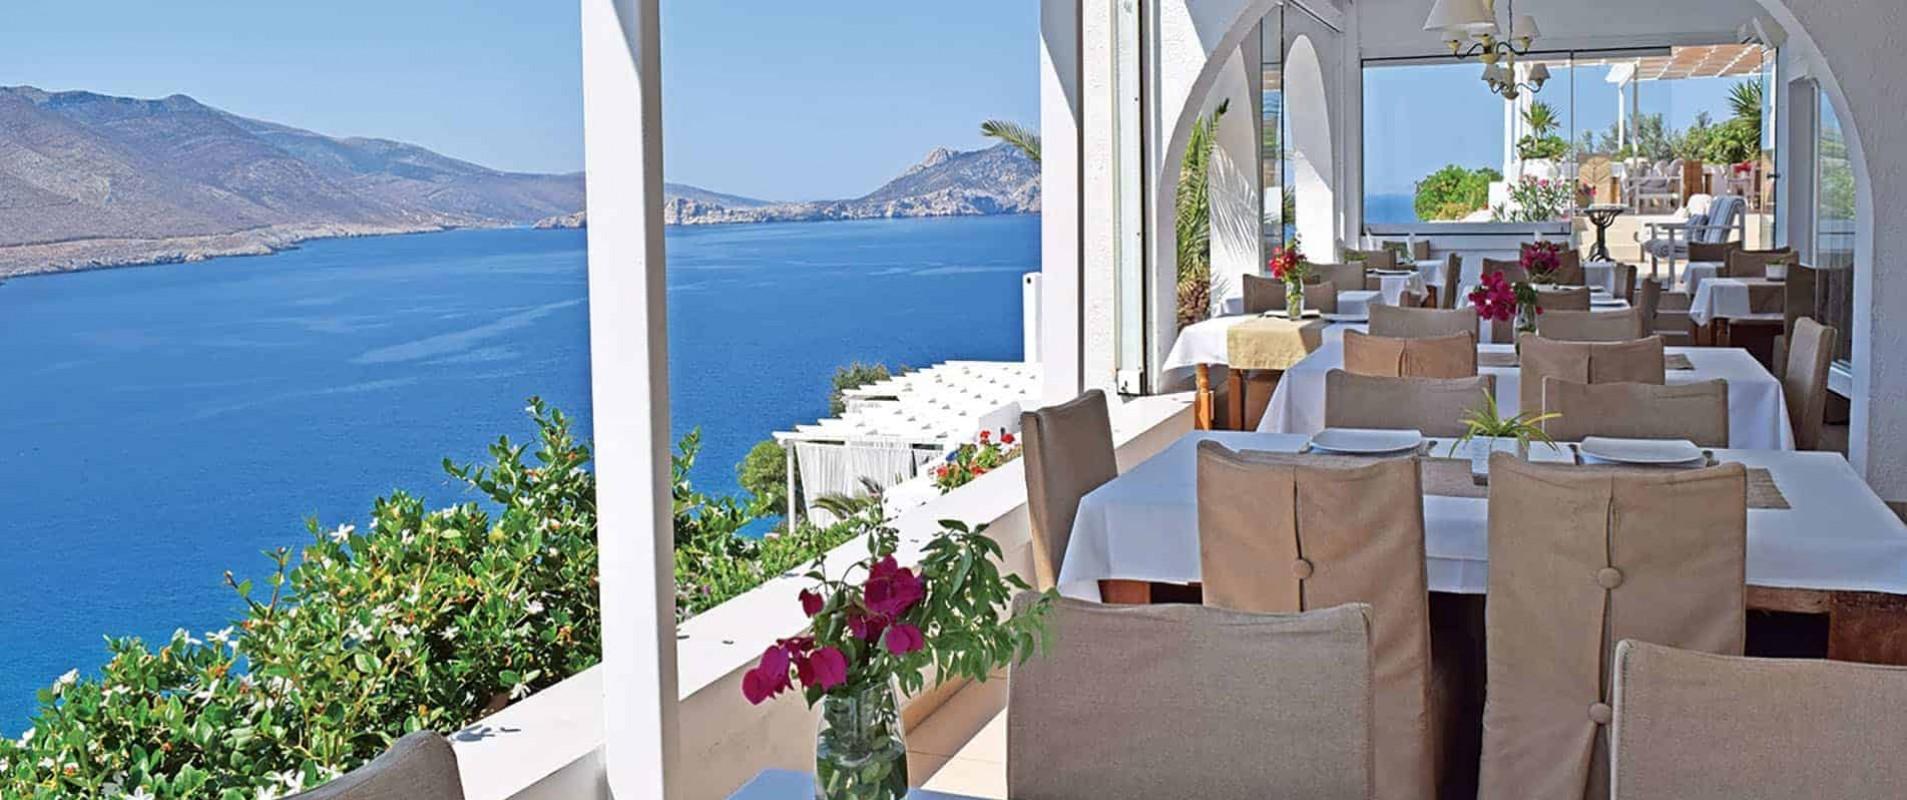 Ambrosia Restaurant View